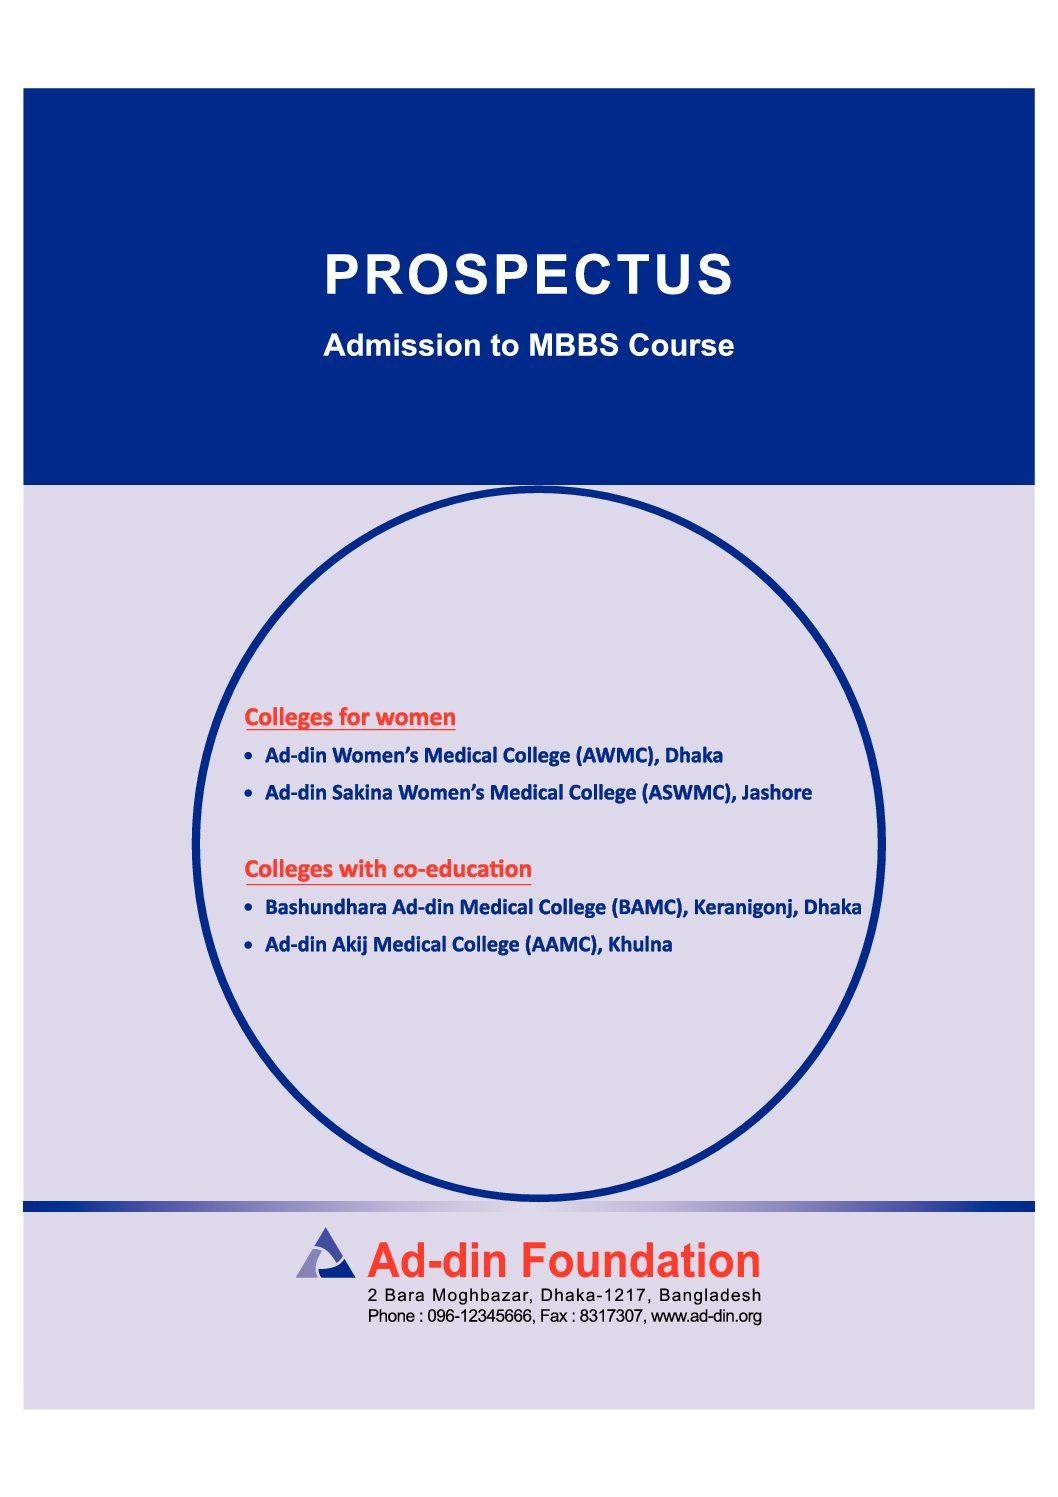 Prospectus of Ad-din Medical College Admission